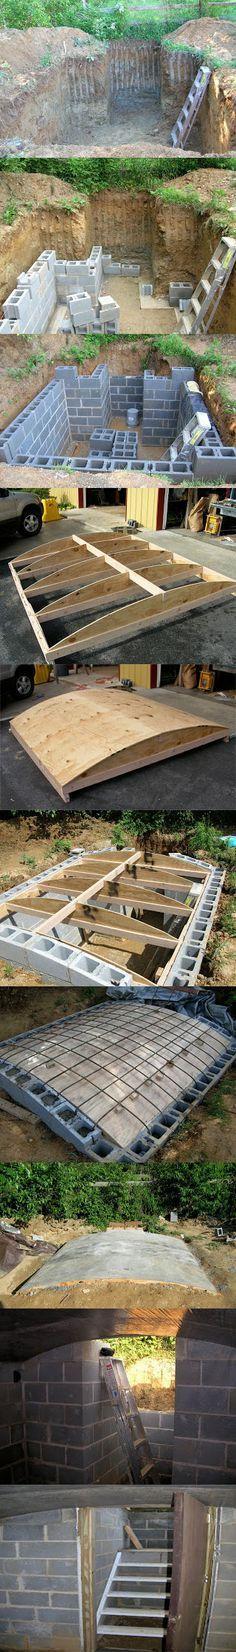 garden design pinterest erdkeller. Black Bedroom Furniture Sets. Home Design Ideas